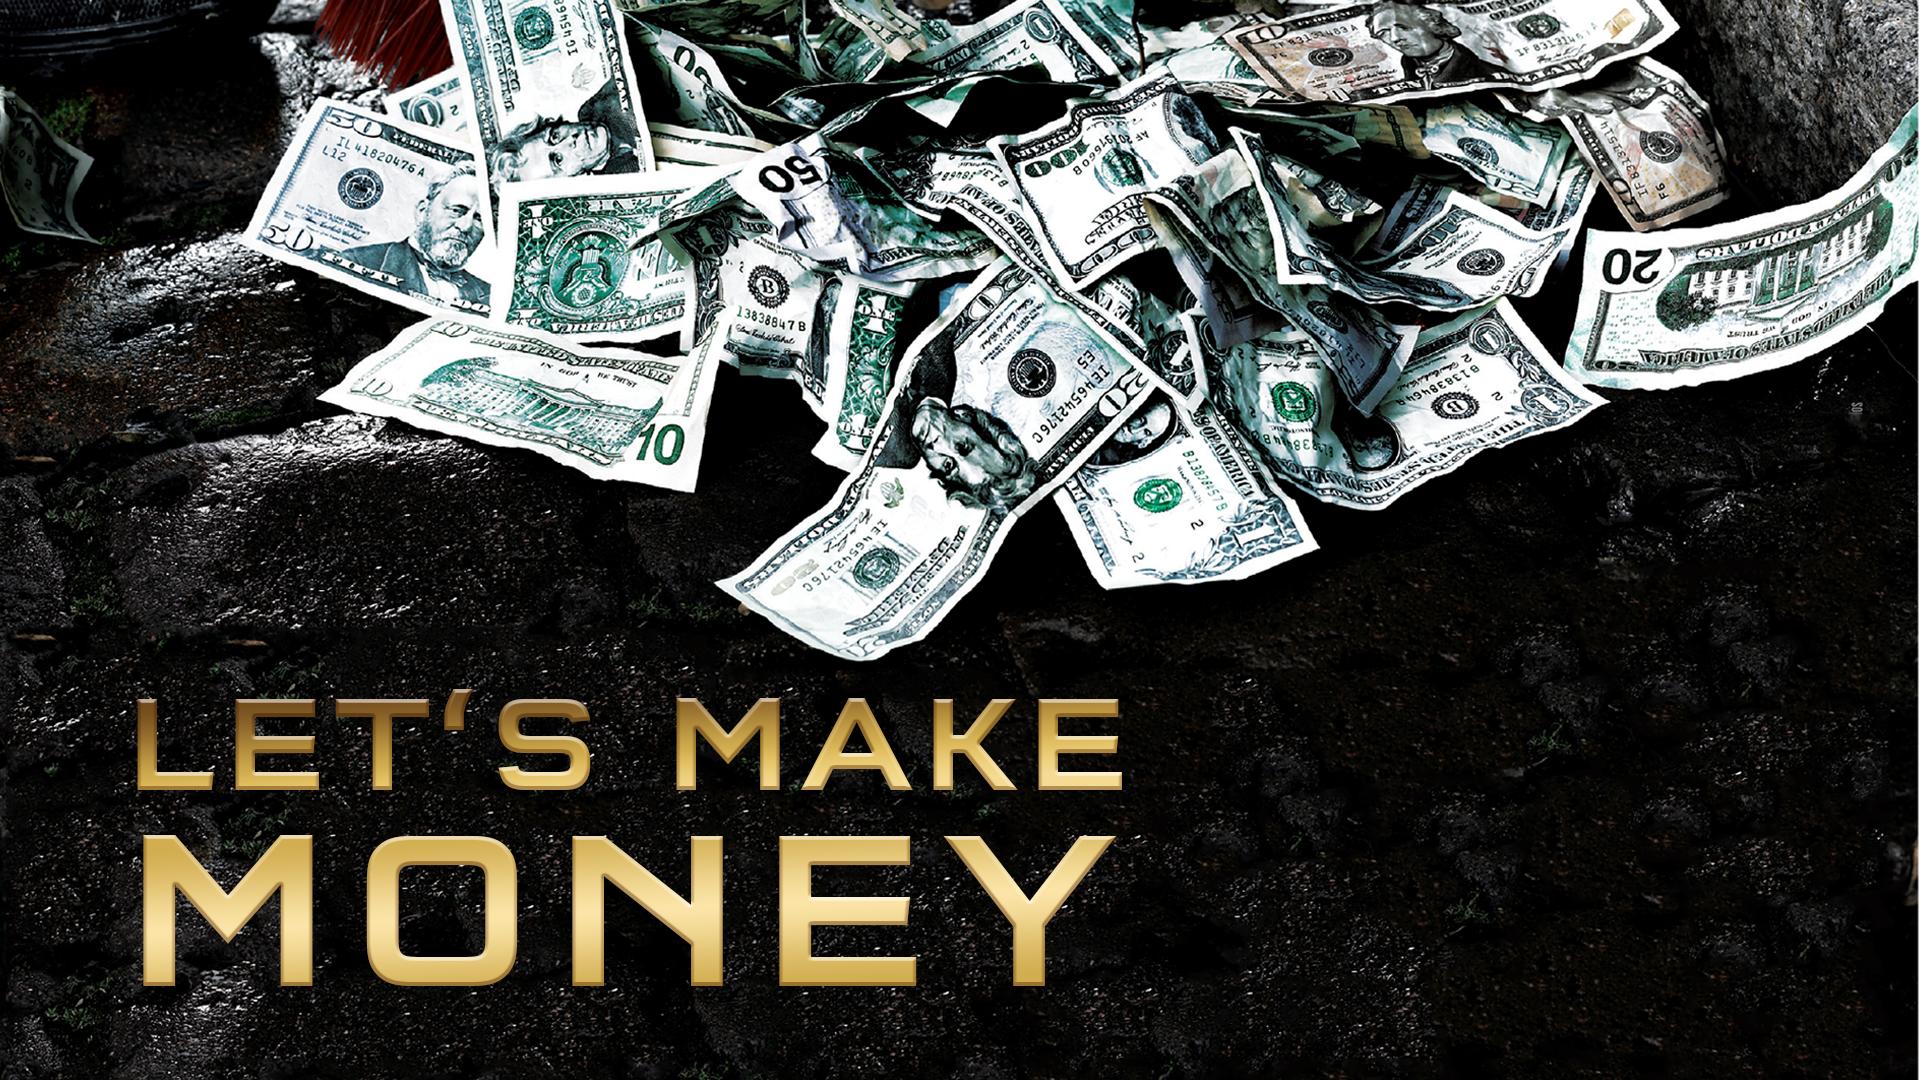 Let´s make money